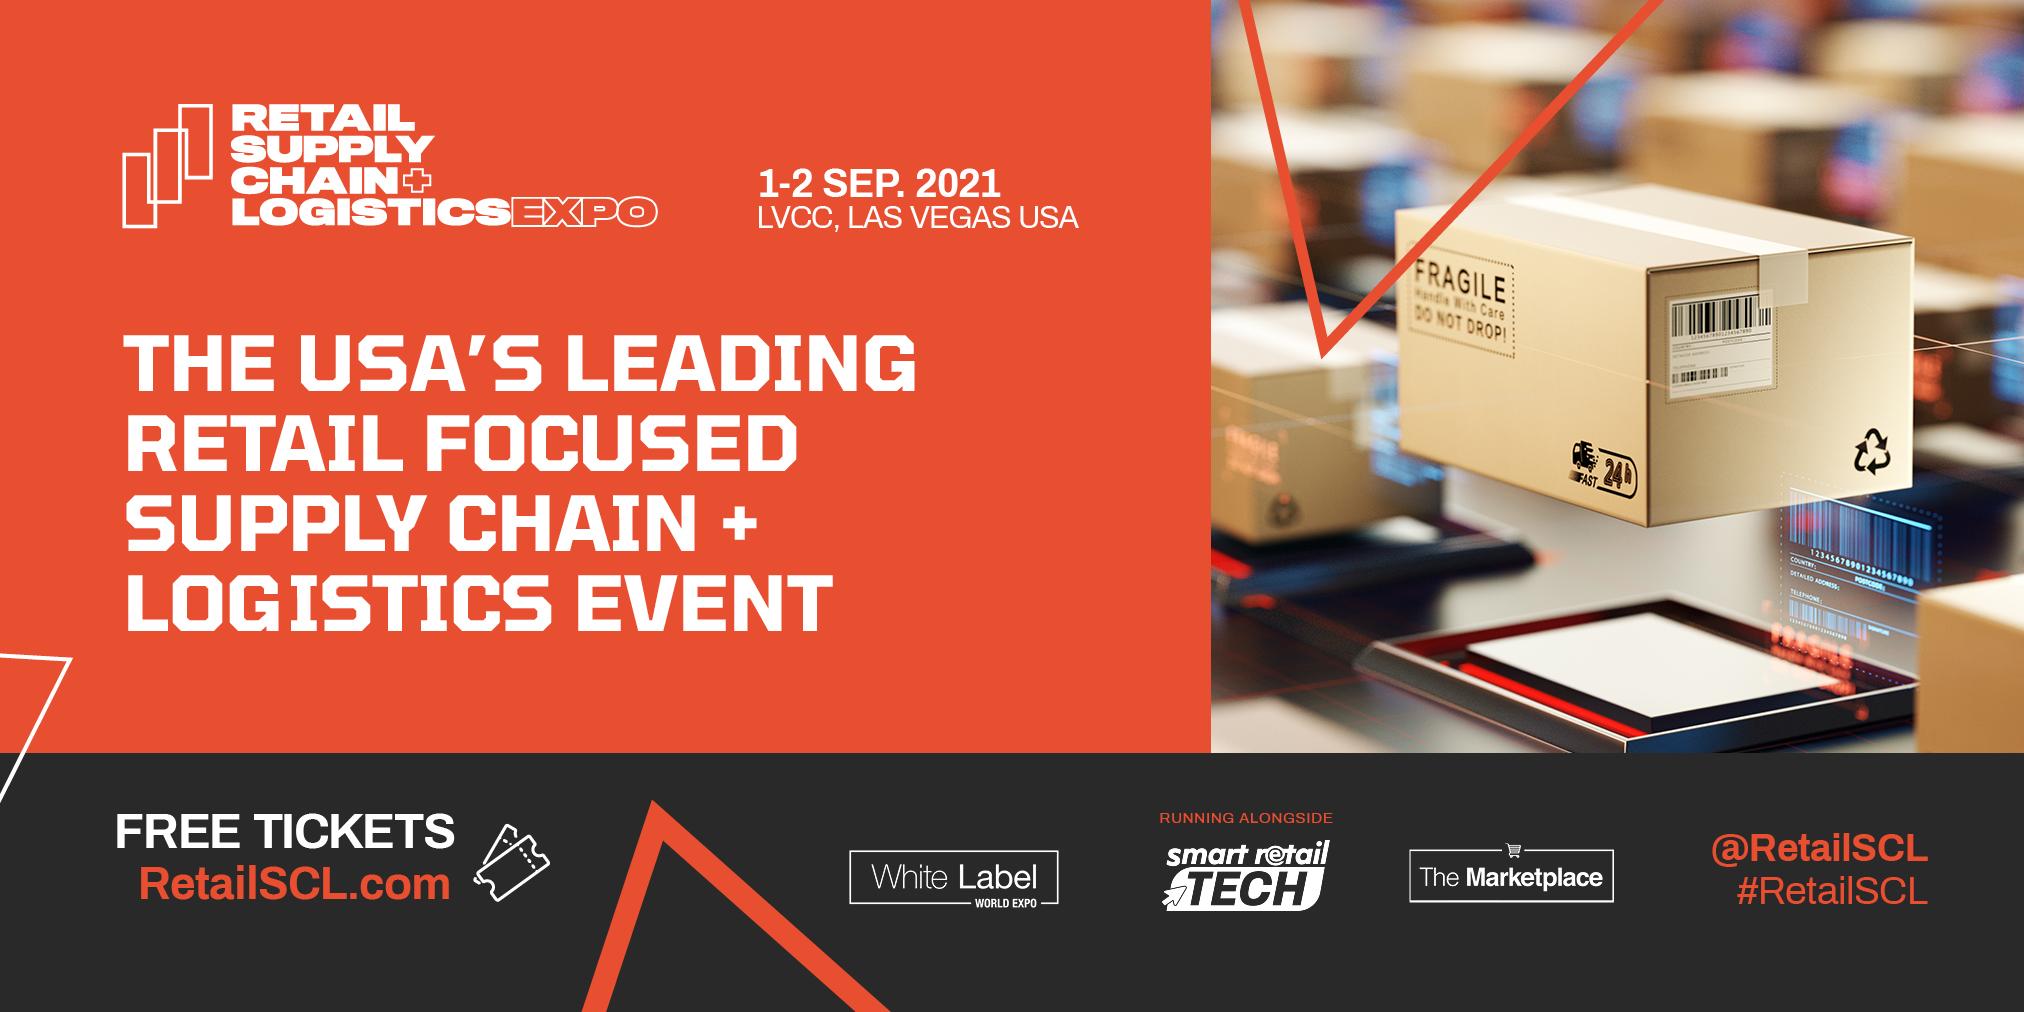 Retail Supply Chain + Logistics Expo US